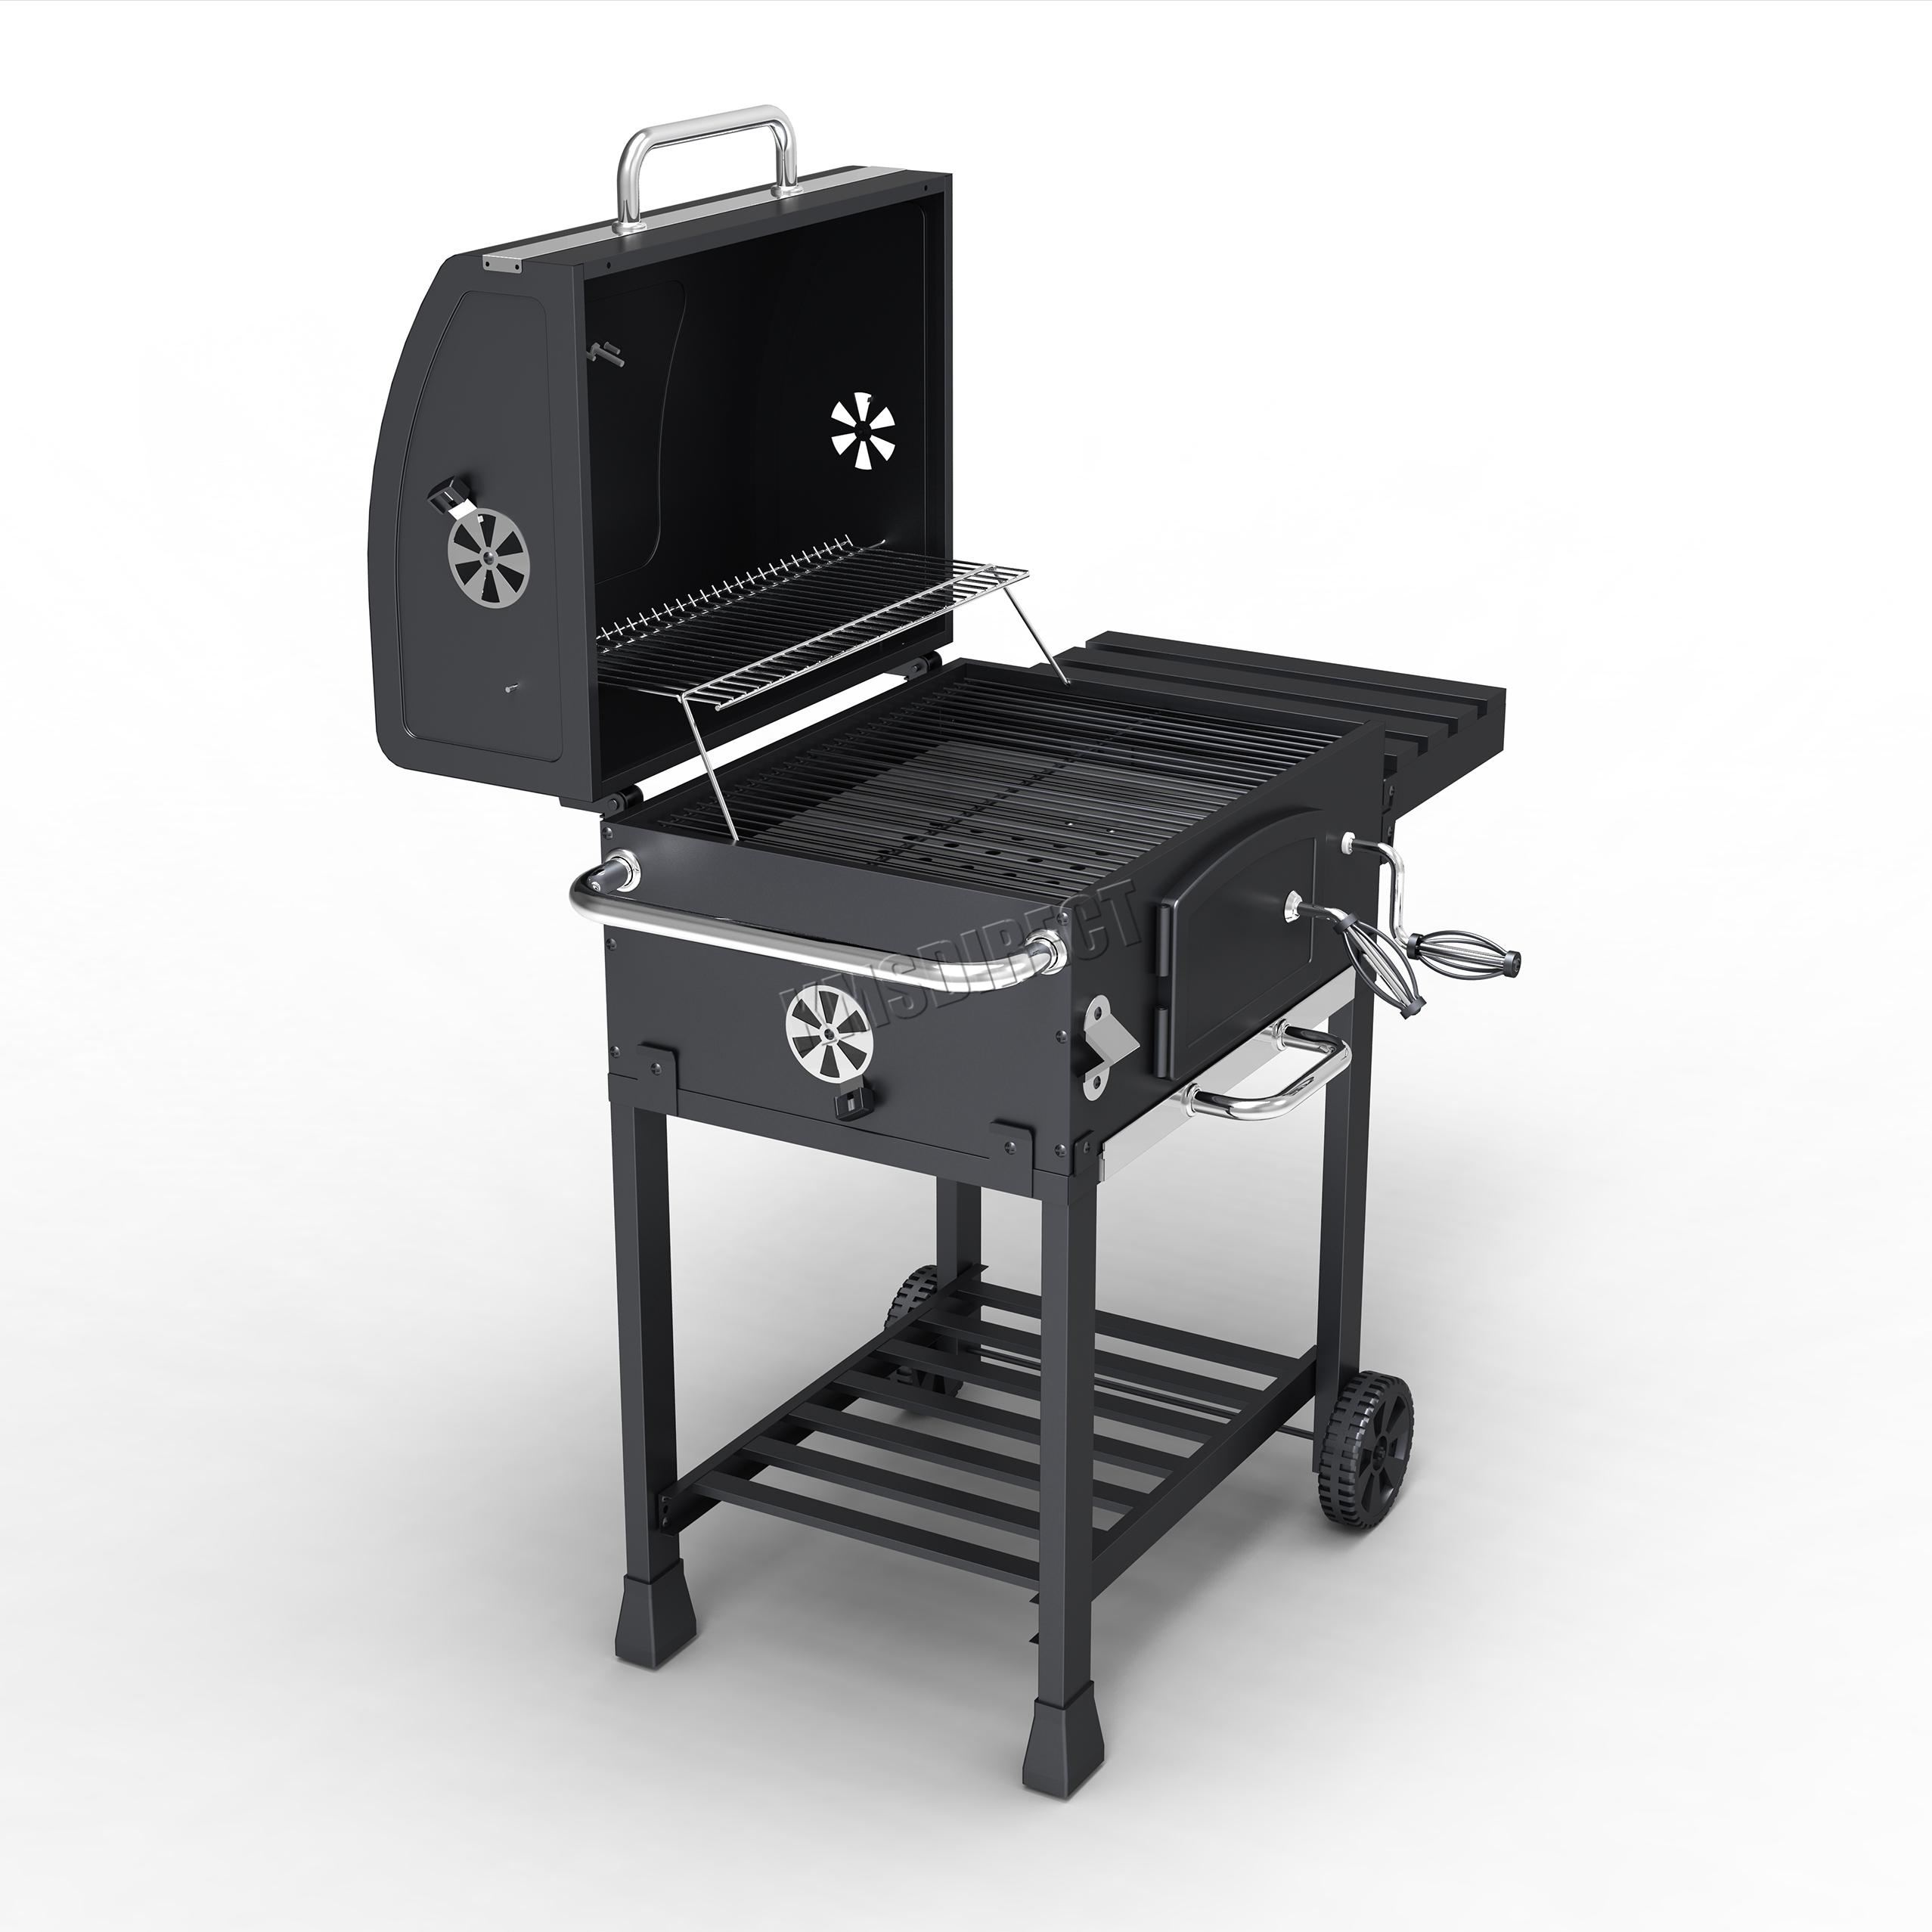 Foxhunter charcoal bbq grill barbecue smoker garden portable outdoor cbg01 grey ebay - Best outdoor barbecue grill ...